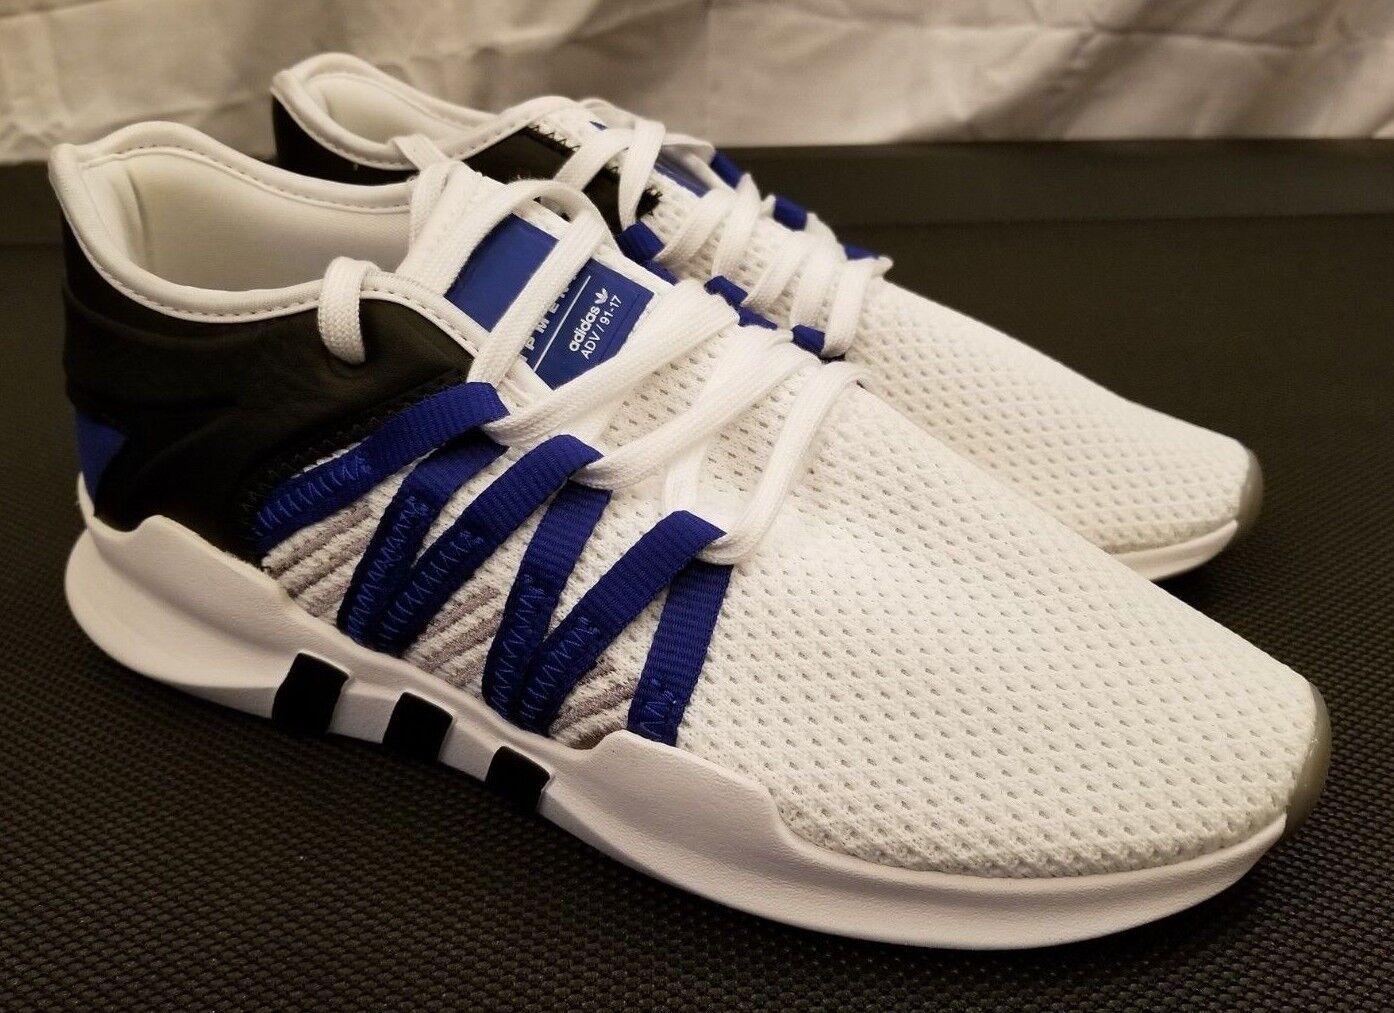 ... greece adidas eqt racing adv running shoes white blue black ac7350  womens size 6 7c197 69da2 9470cf8ab533